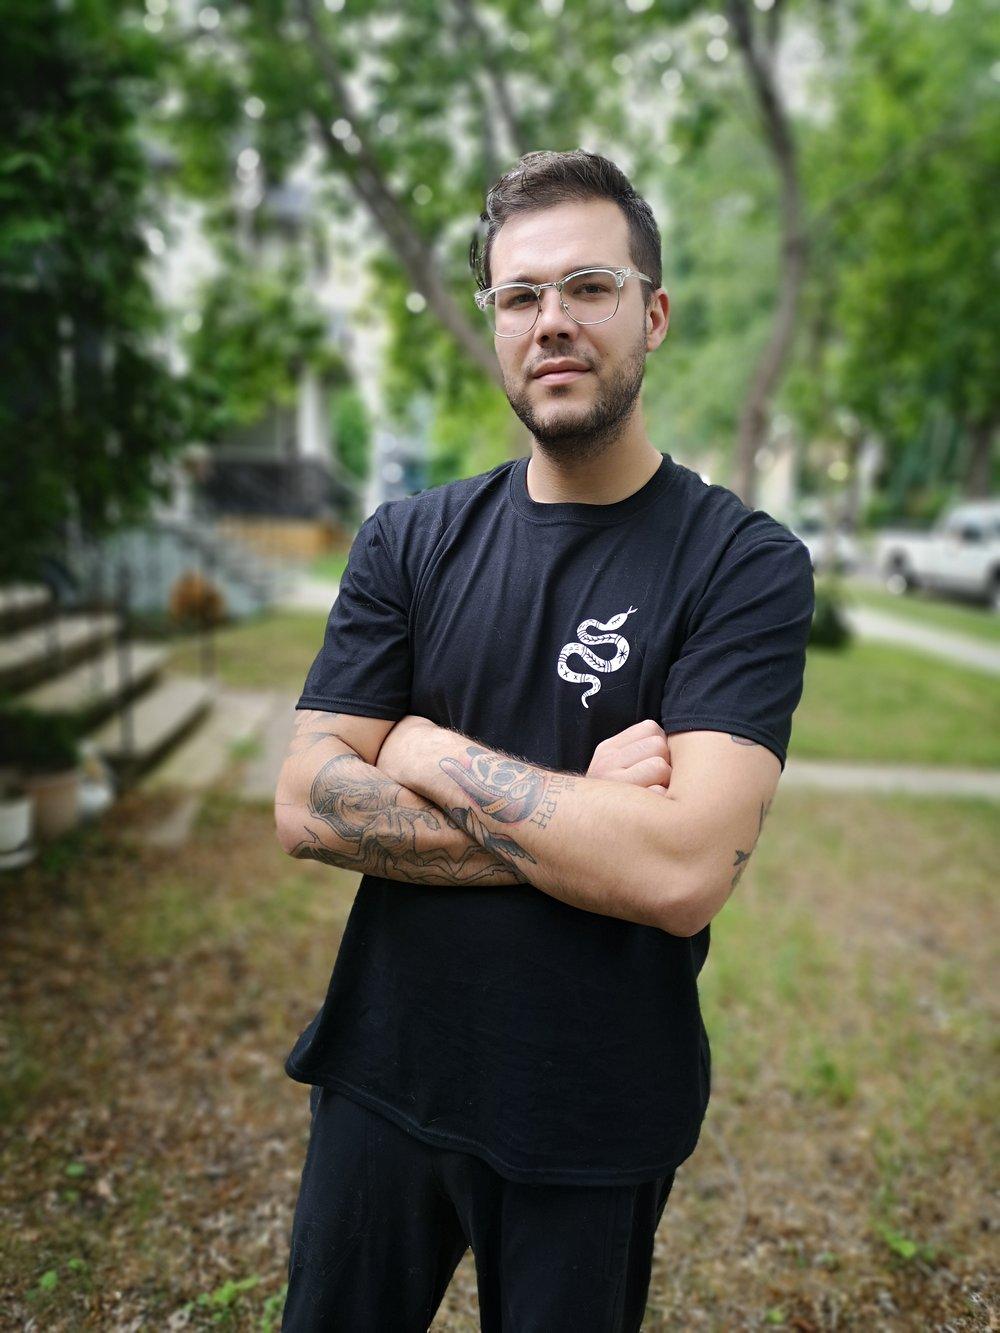 T-shirt (XS-5XL) restock coming soon